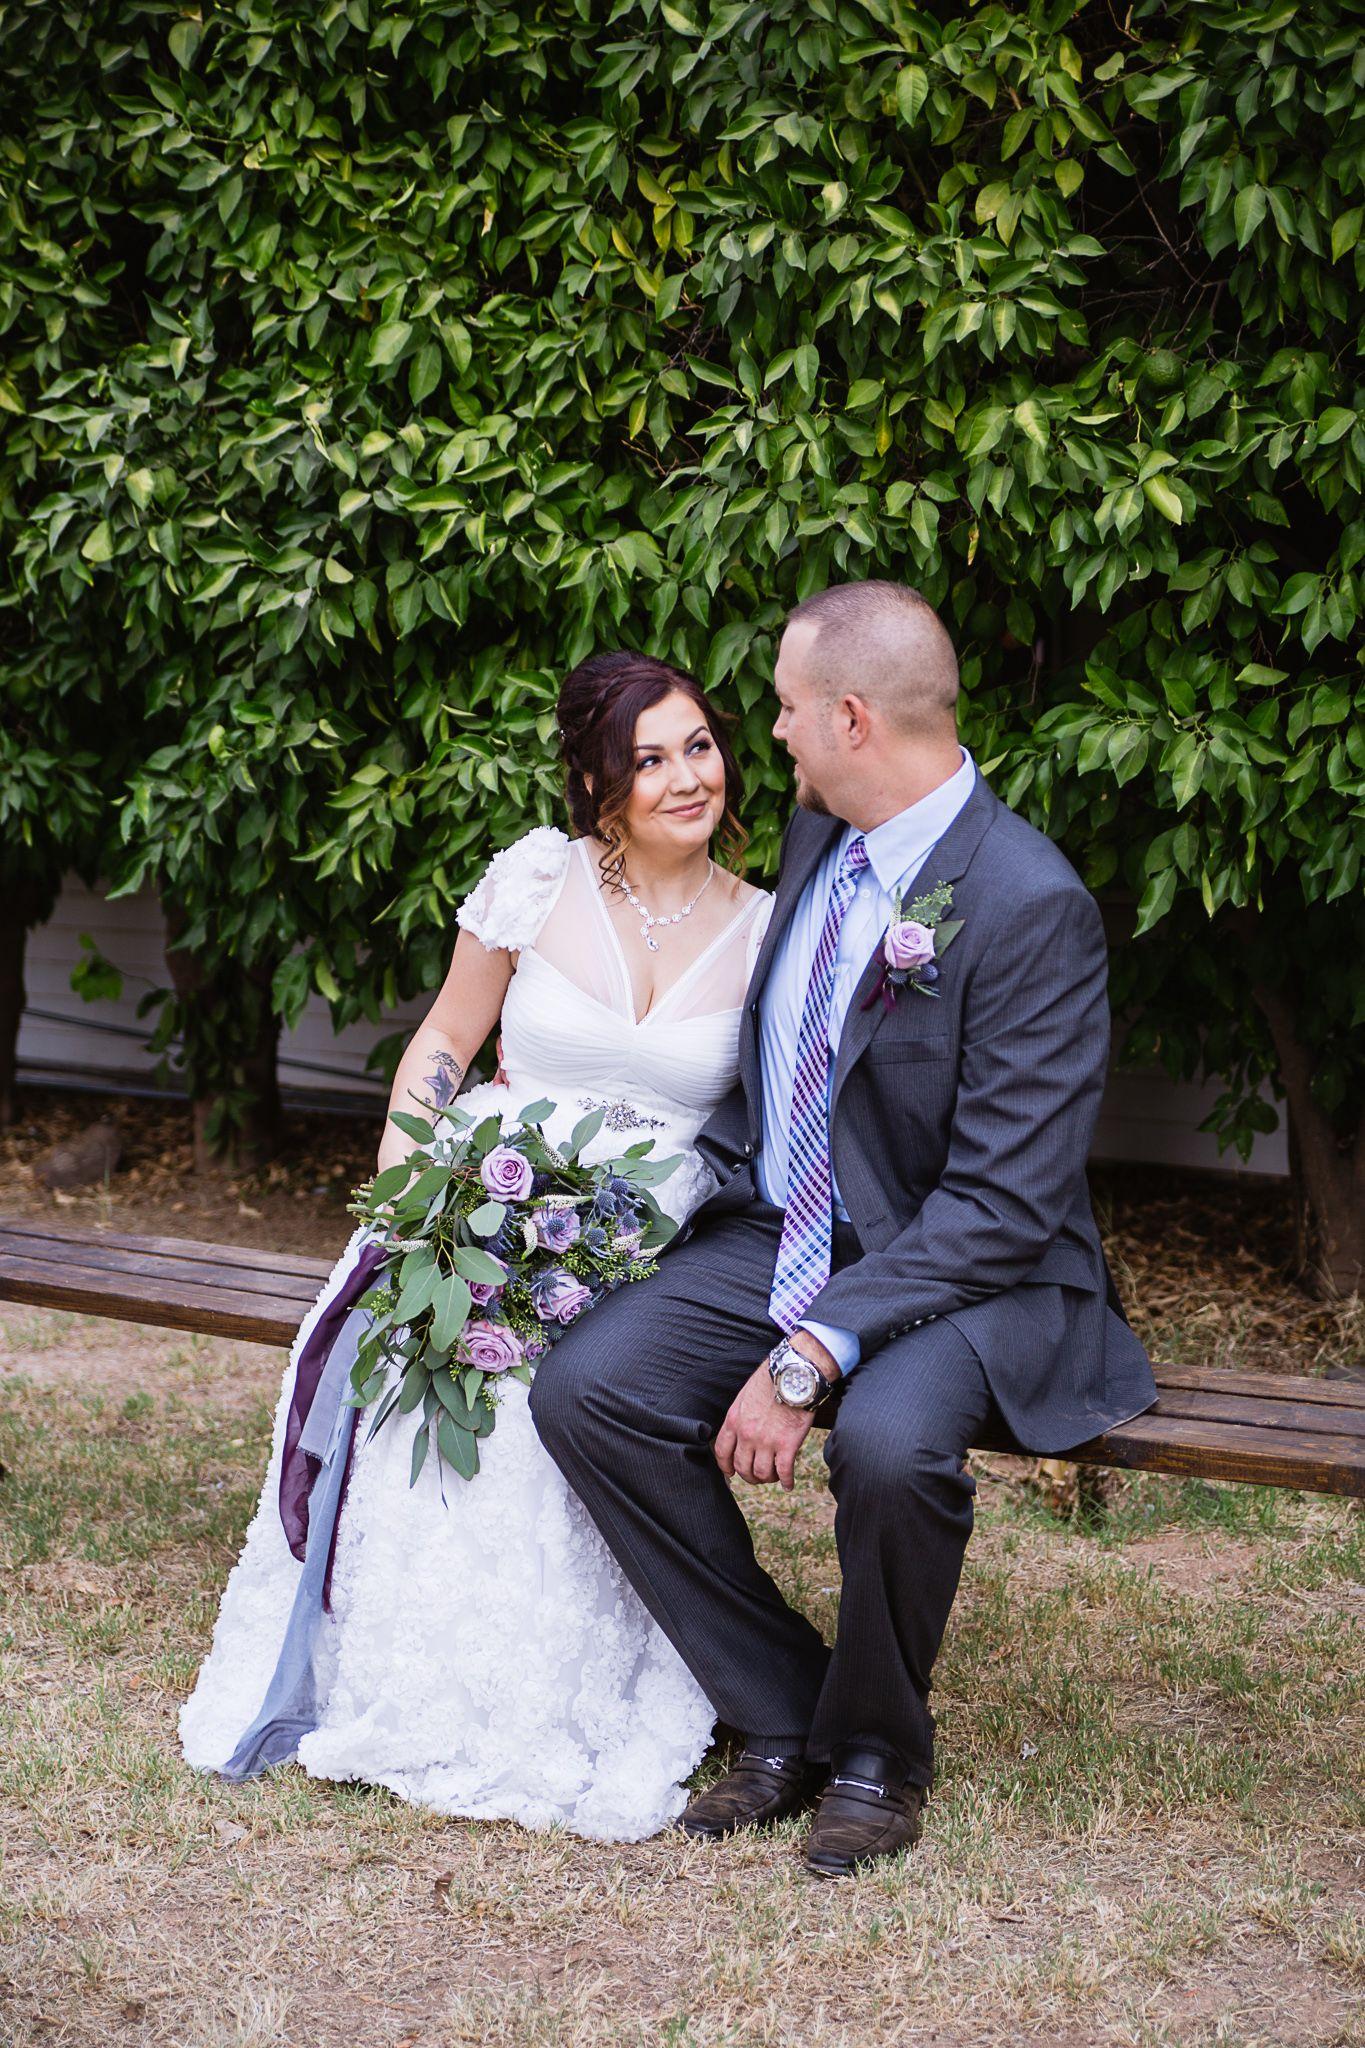 Dusty blue and purple backyard wedding pma weddings pinterest